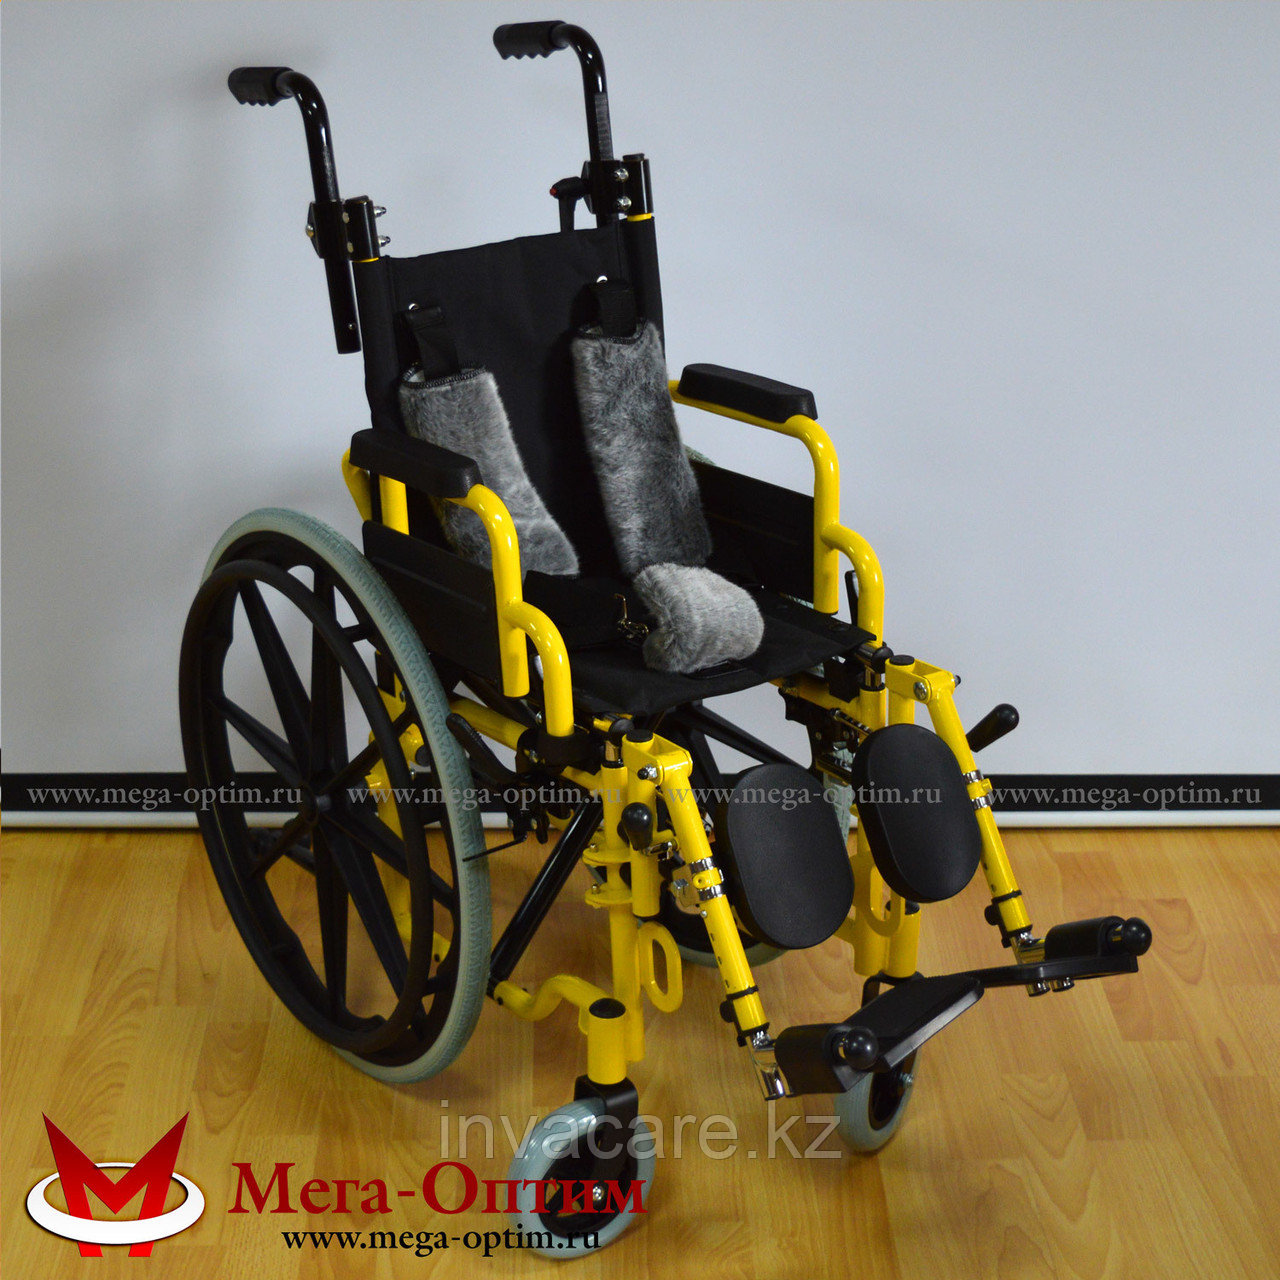 Инвалидная коляска H-714N